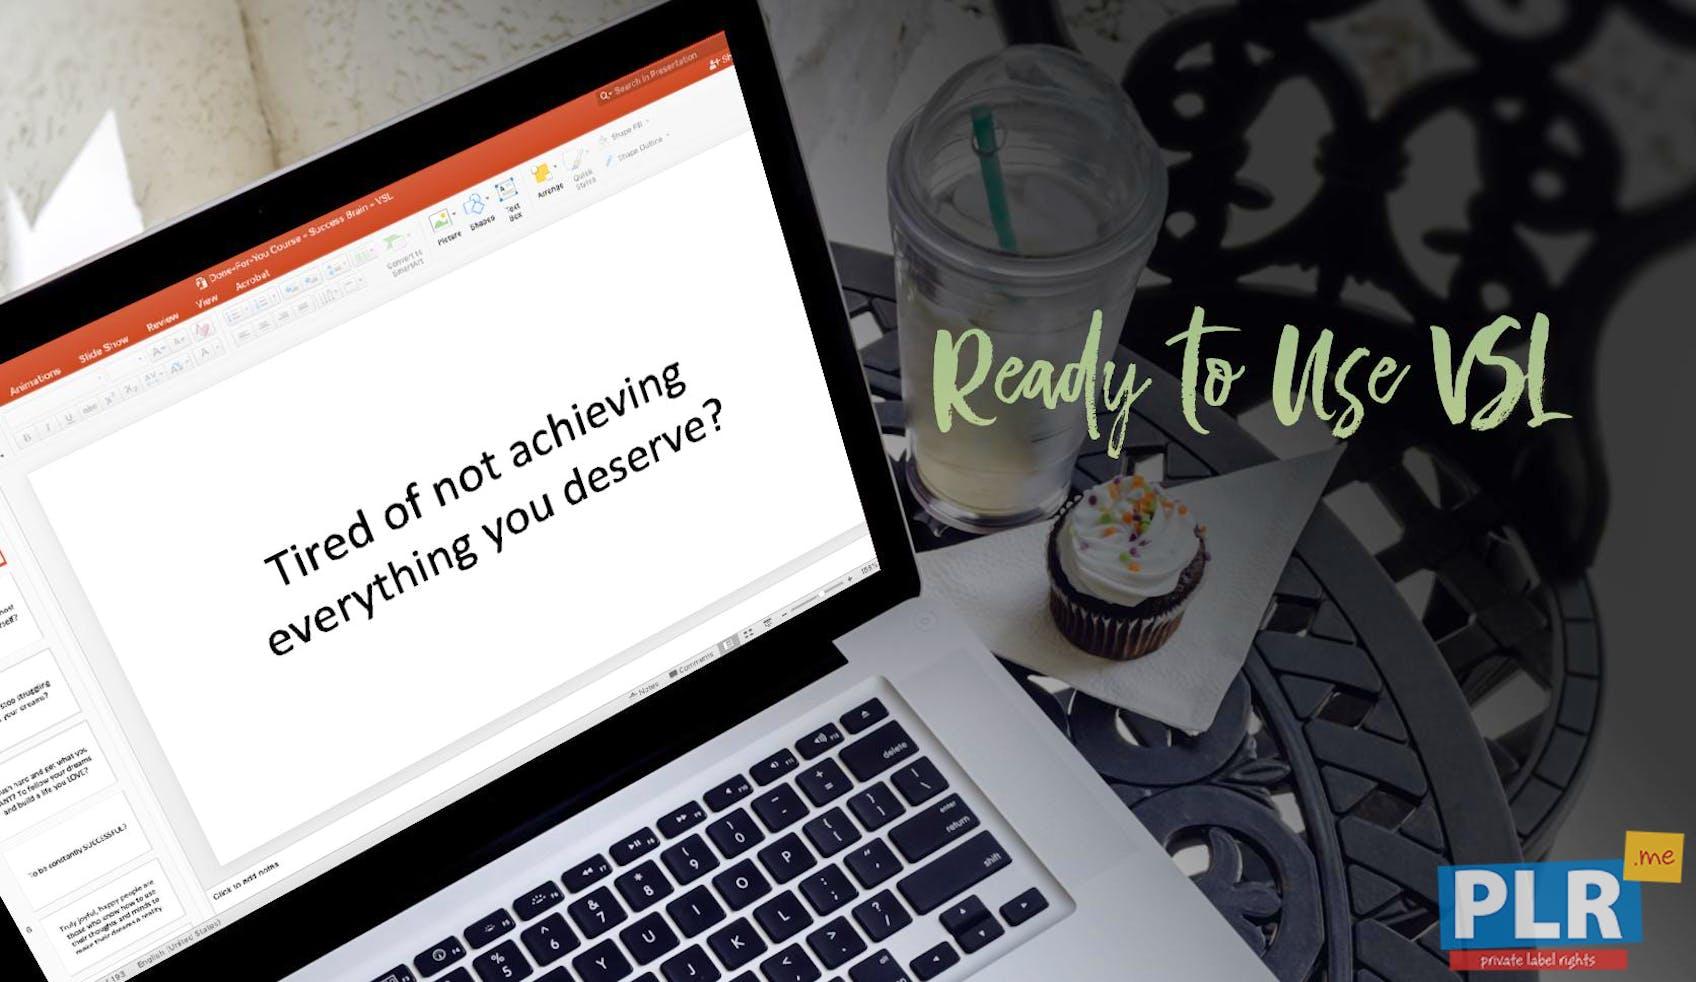 The Success Brain: SMART Goals And Healthy Habits - Video Sales Letter Slides